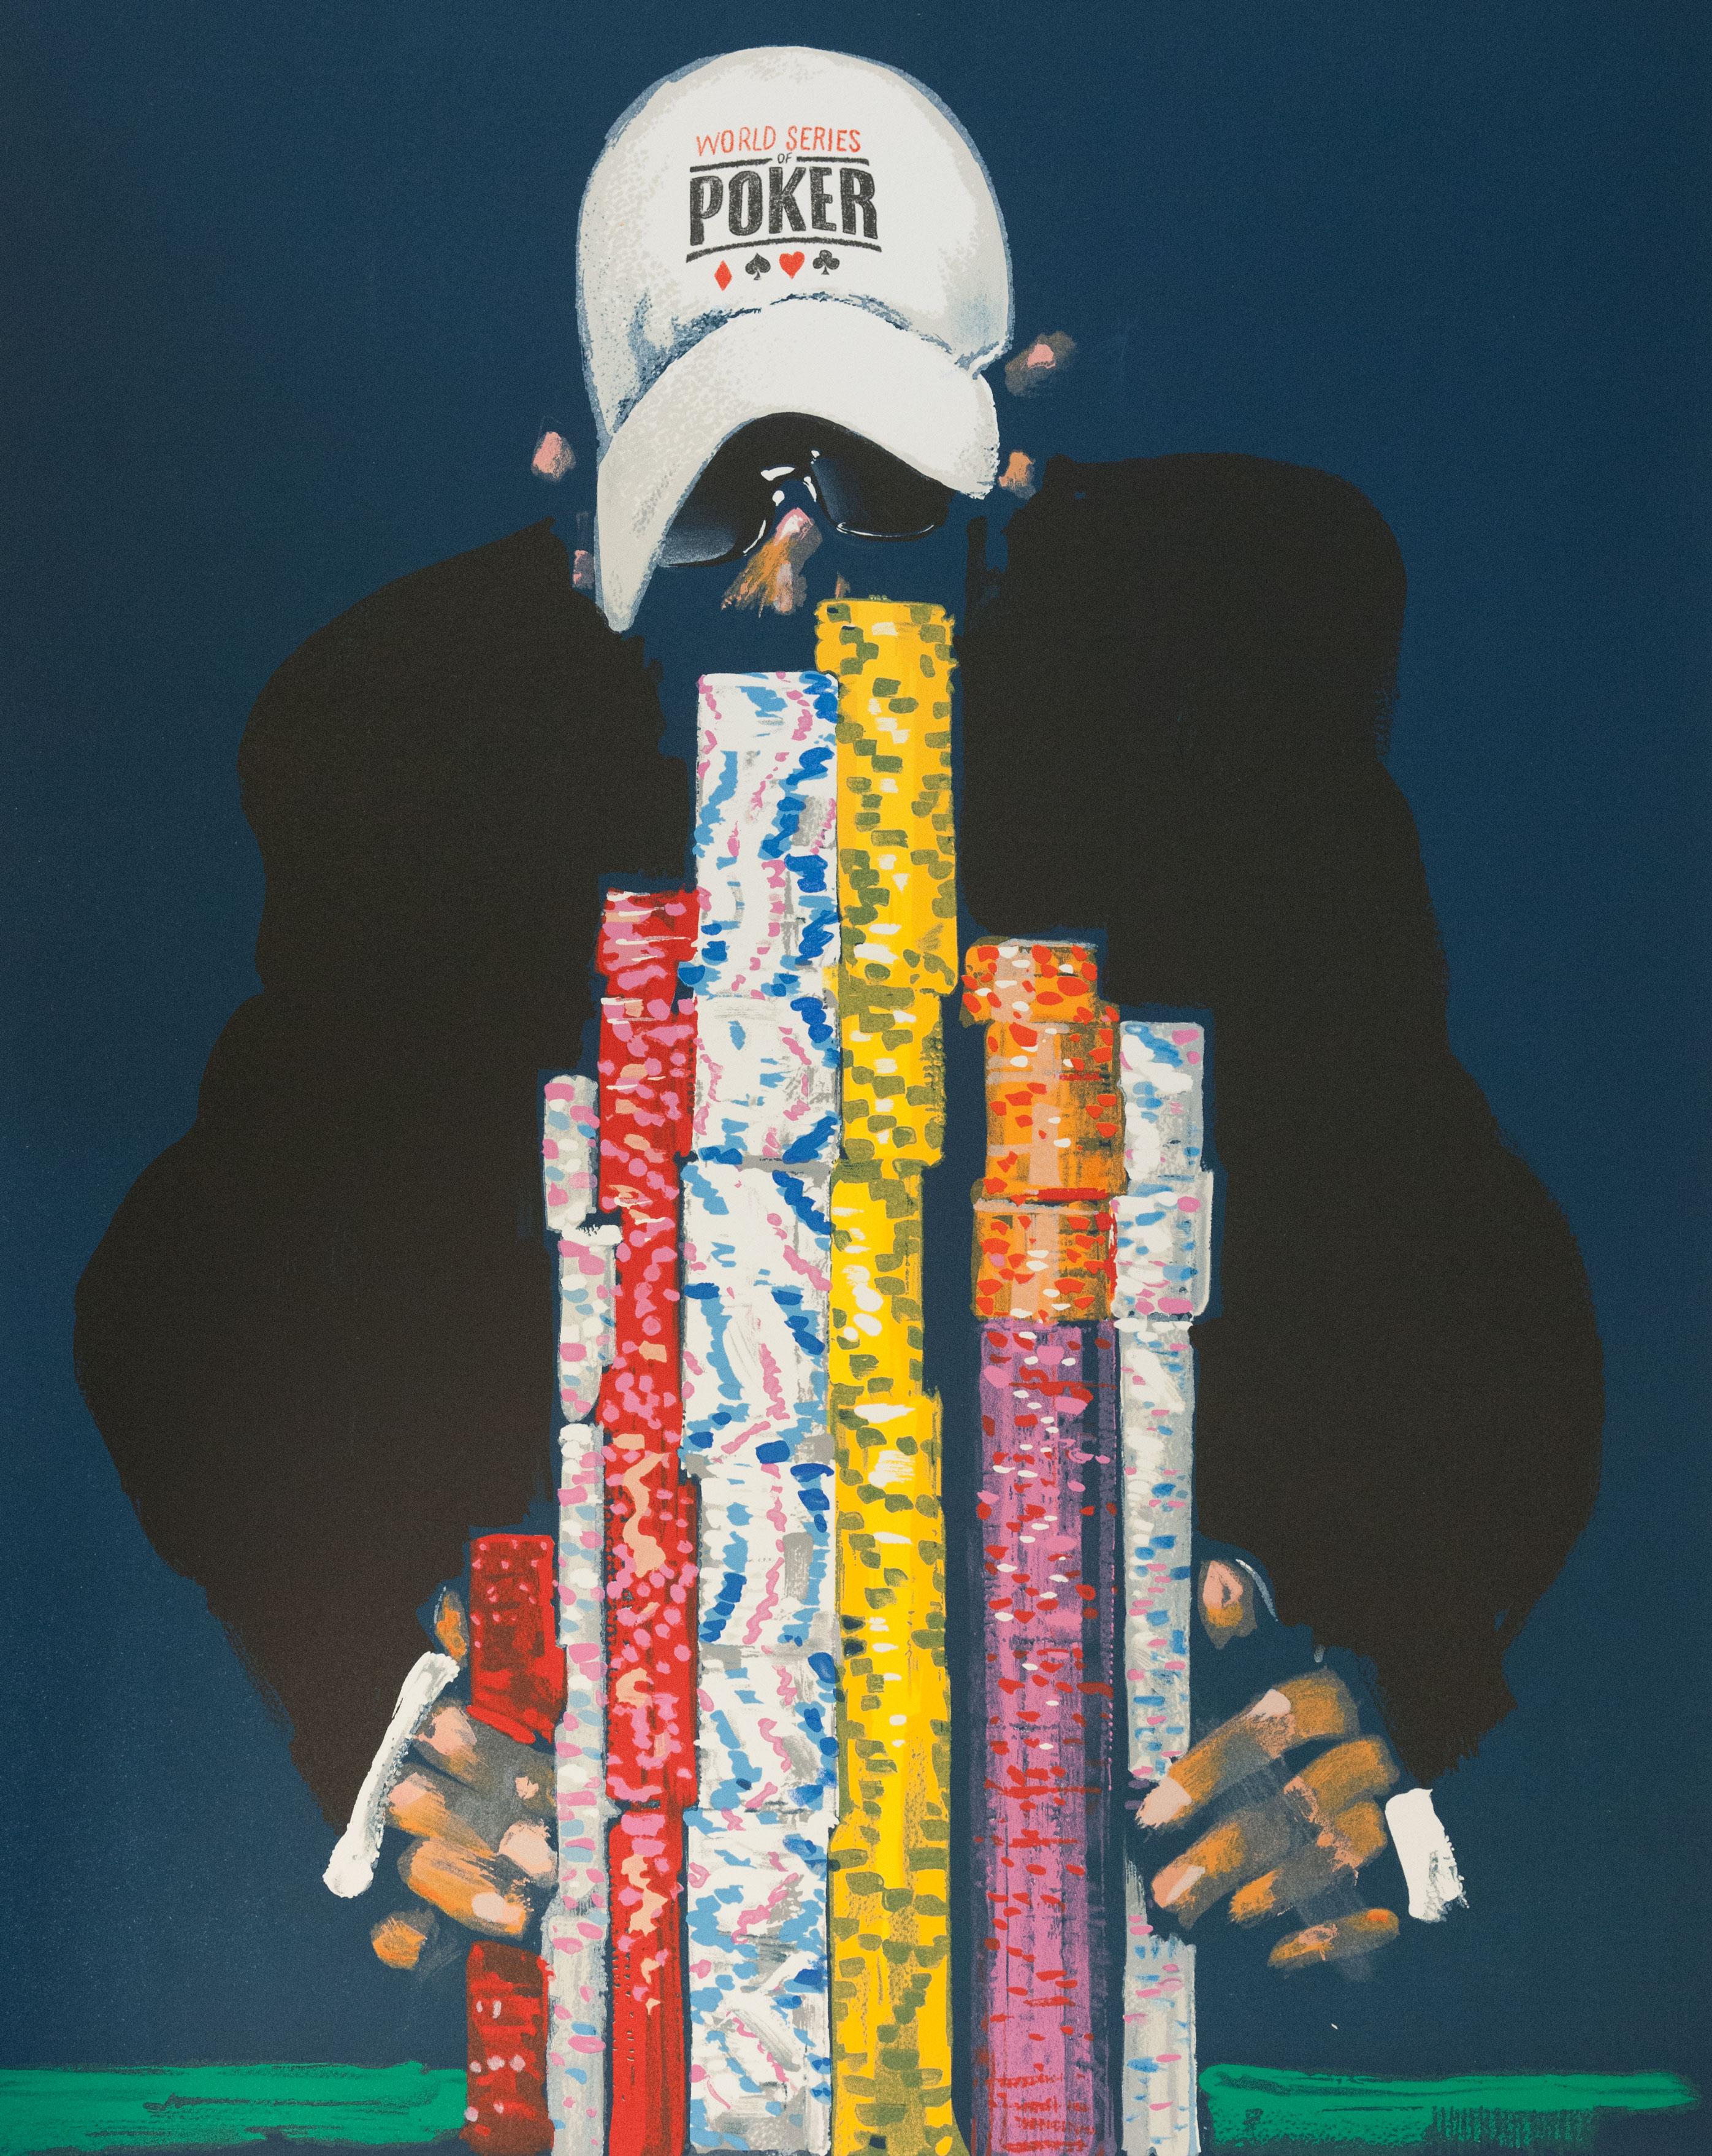 Waldemar Swierzy gangster art fine art lithograph poker chips gambling las vegas polish artist world series of poker